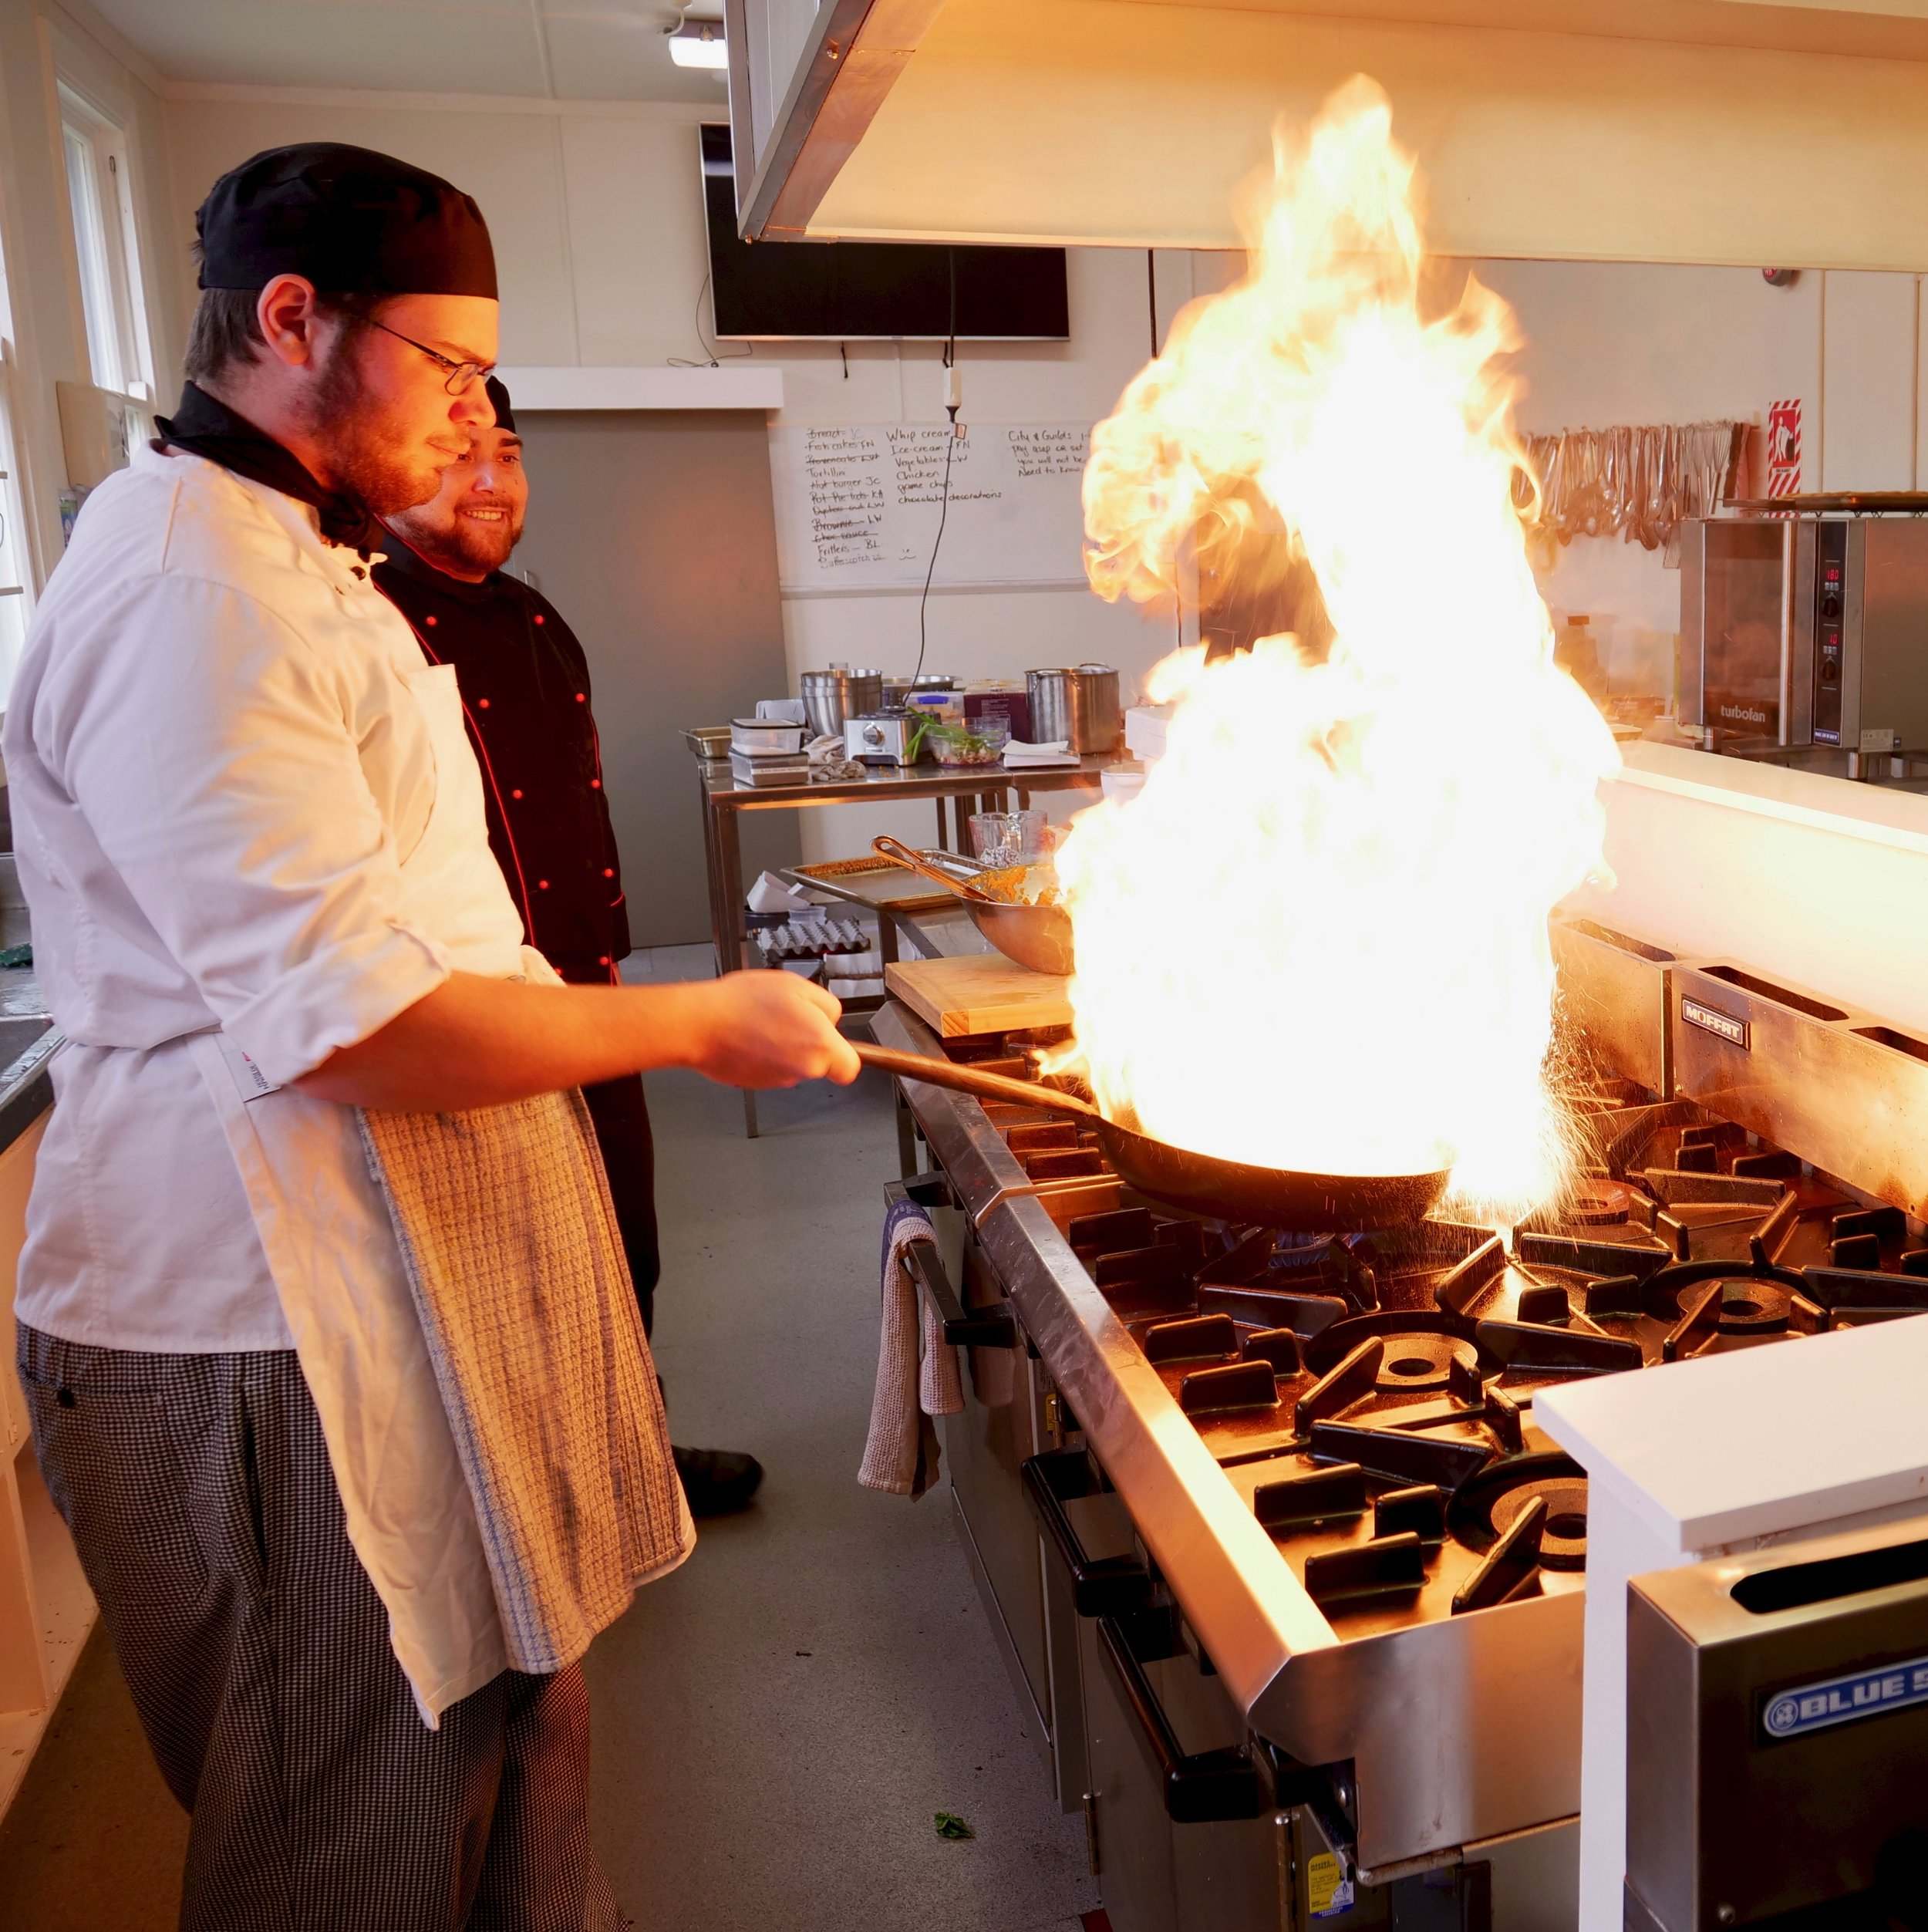 Chef Student in Kitchen